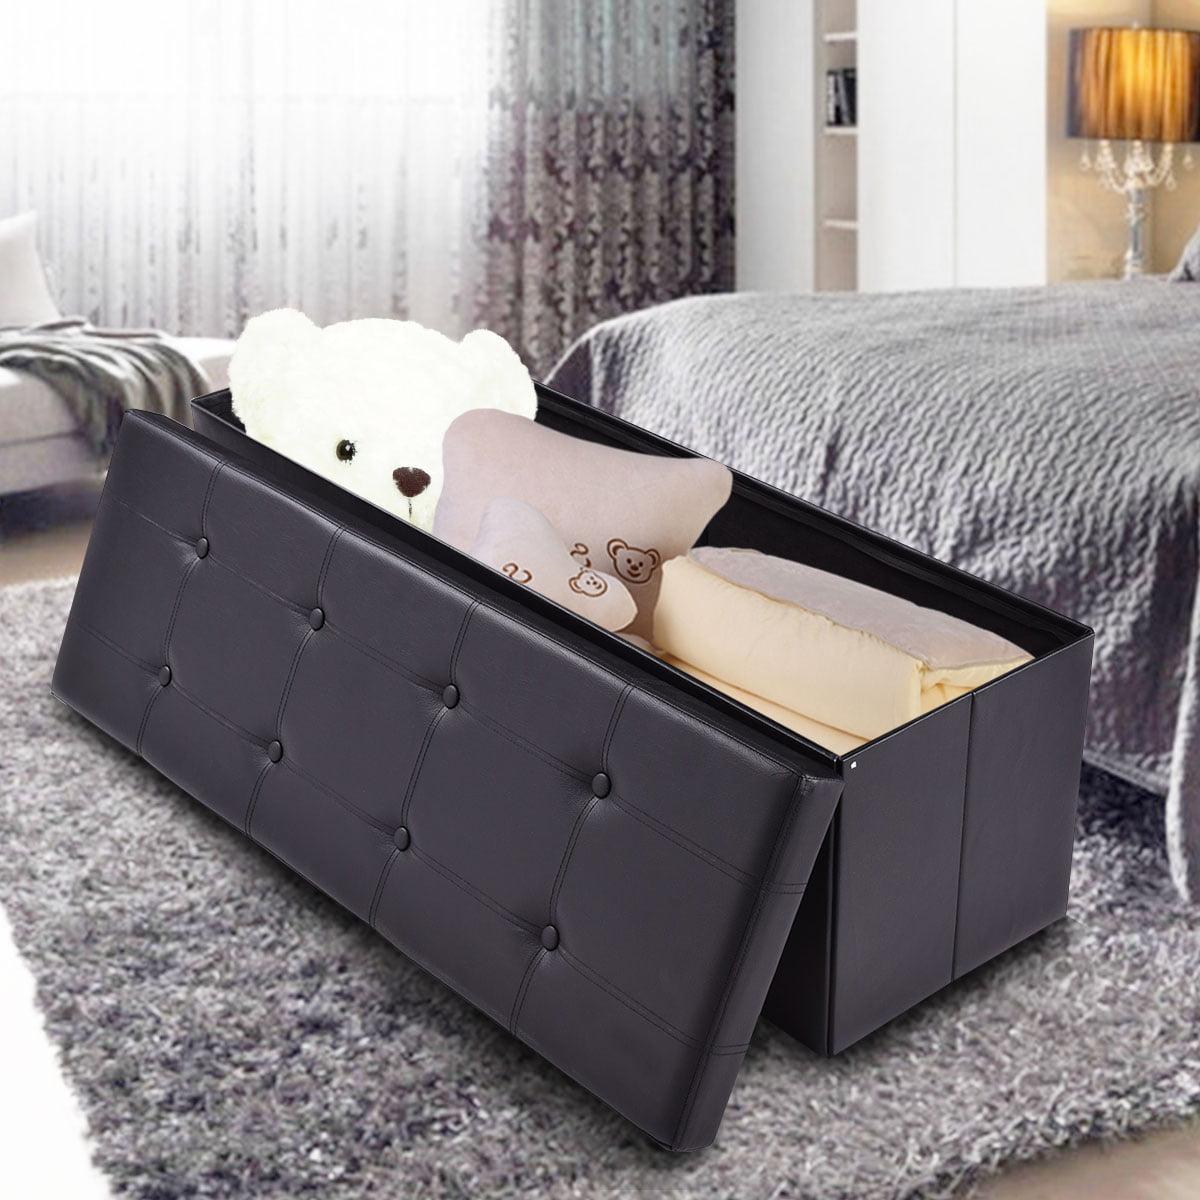 Costway 45''x15''x15'' Large Folding Storage Faux Leather Ottoman Pouffe Box Stool Black by Costway